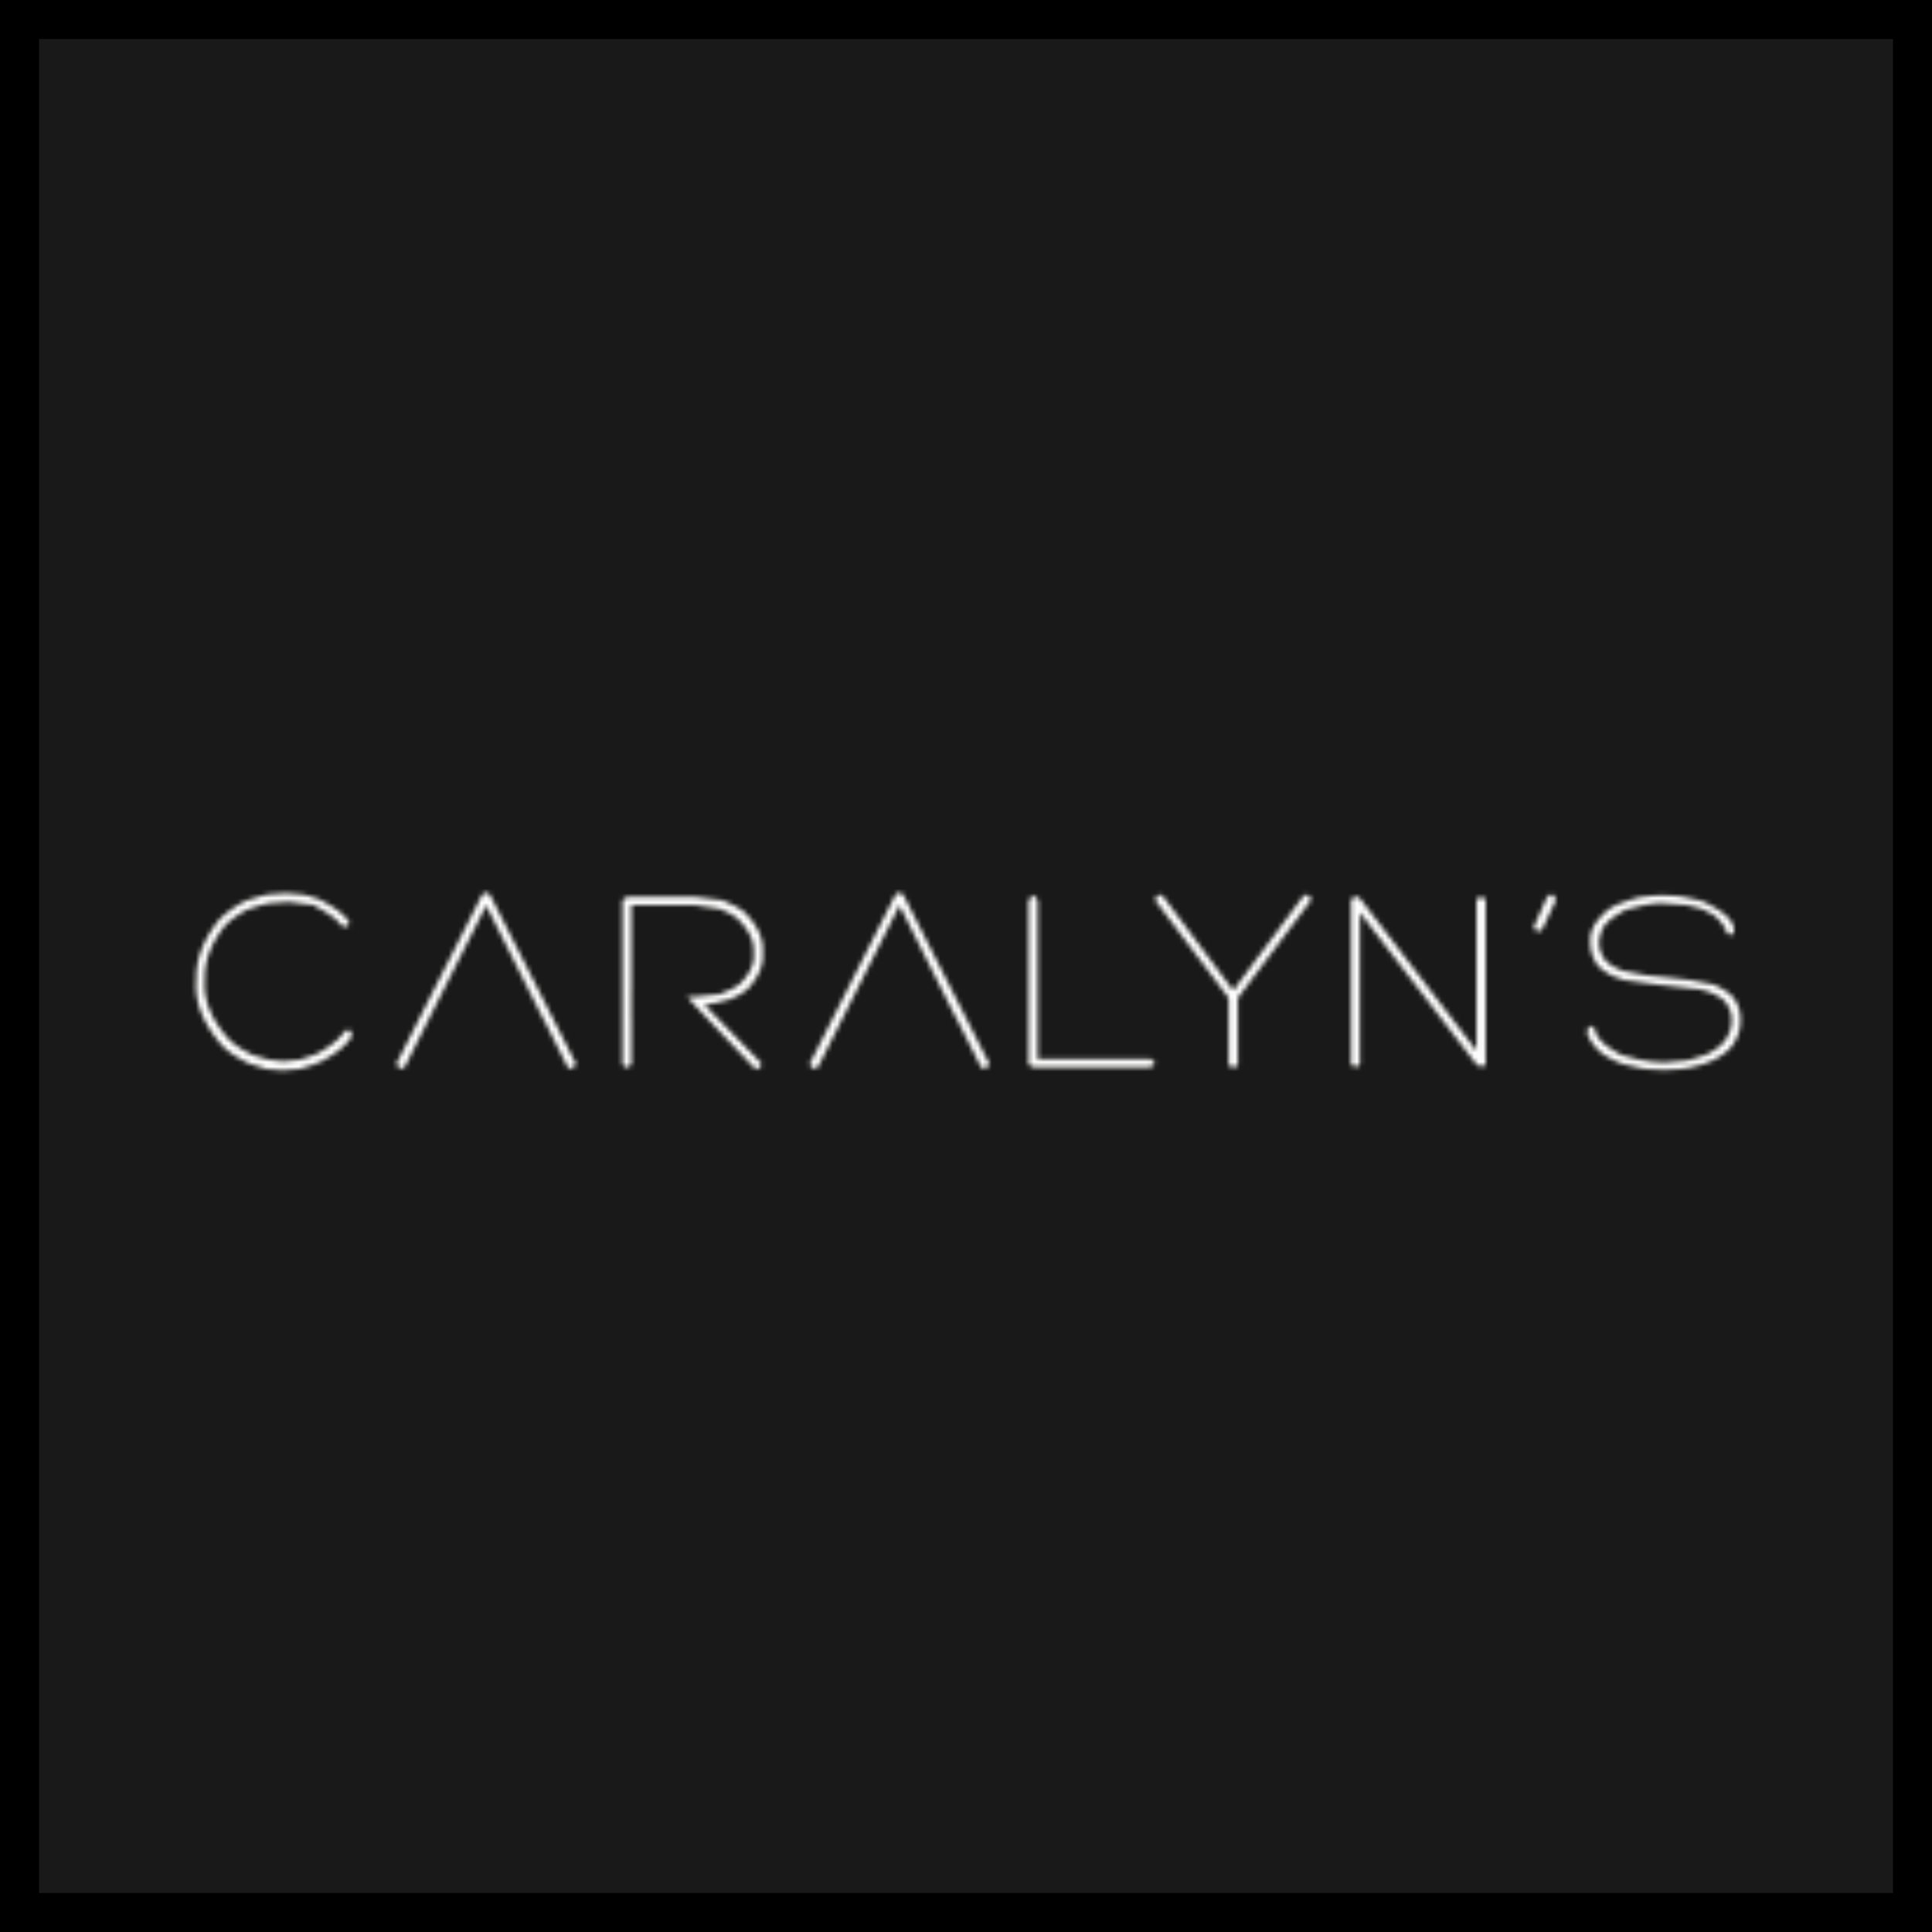 CaralynsSQ.jpg